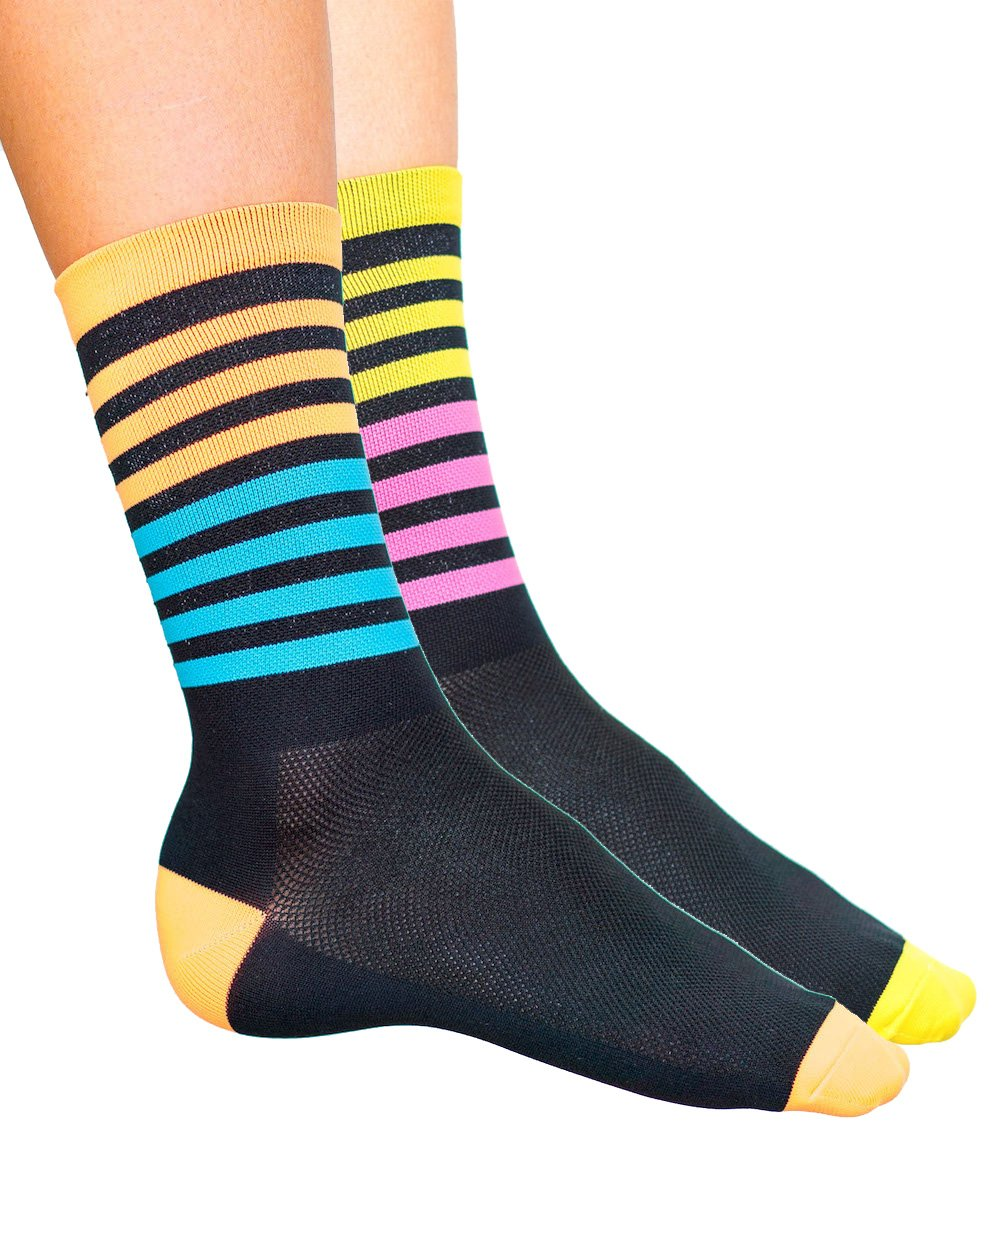 Cosmic Socks 6'' All Sorts, Cycling Socks size 6-11,Blue, Orange, Pink, Yellow, Black